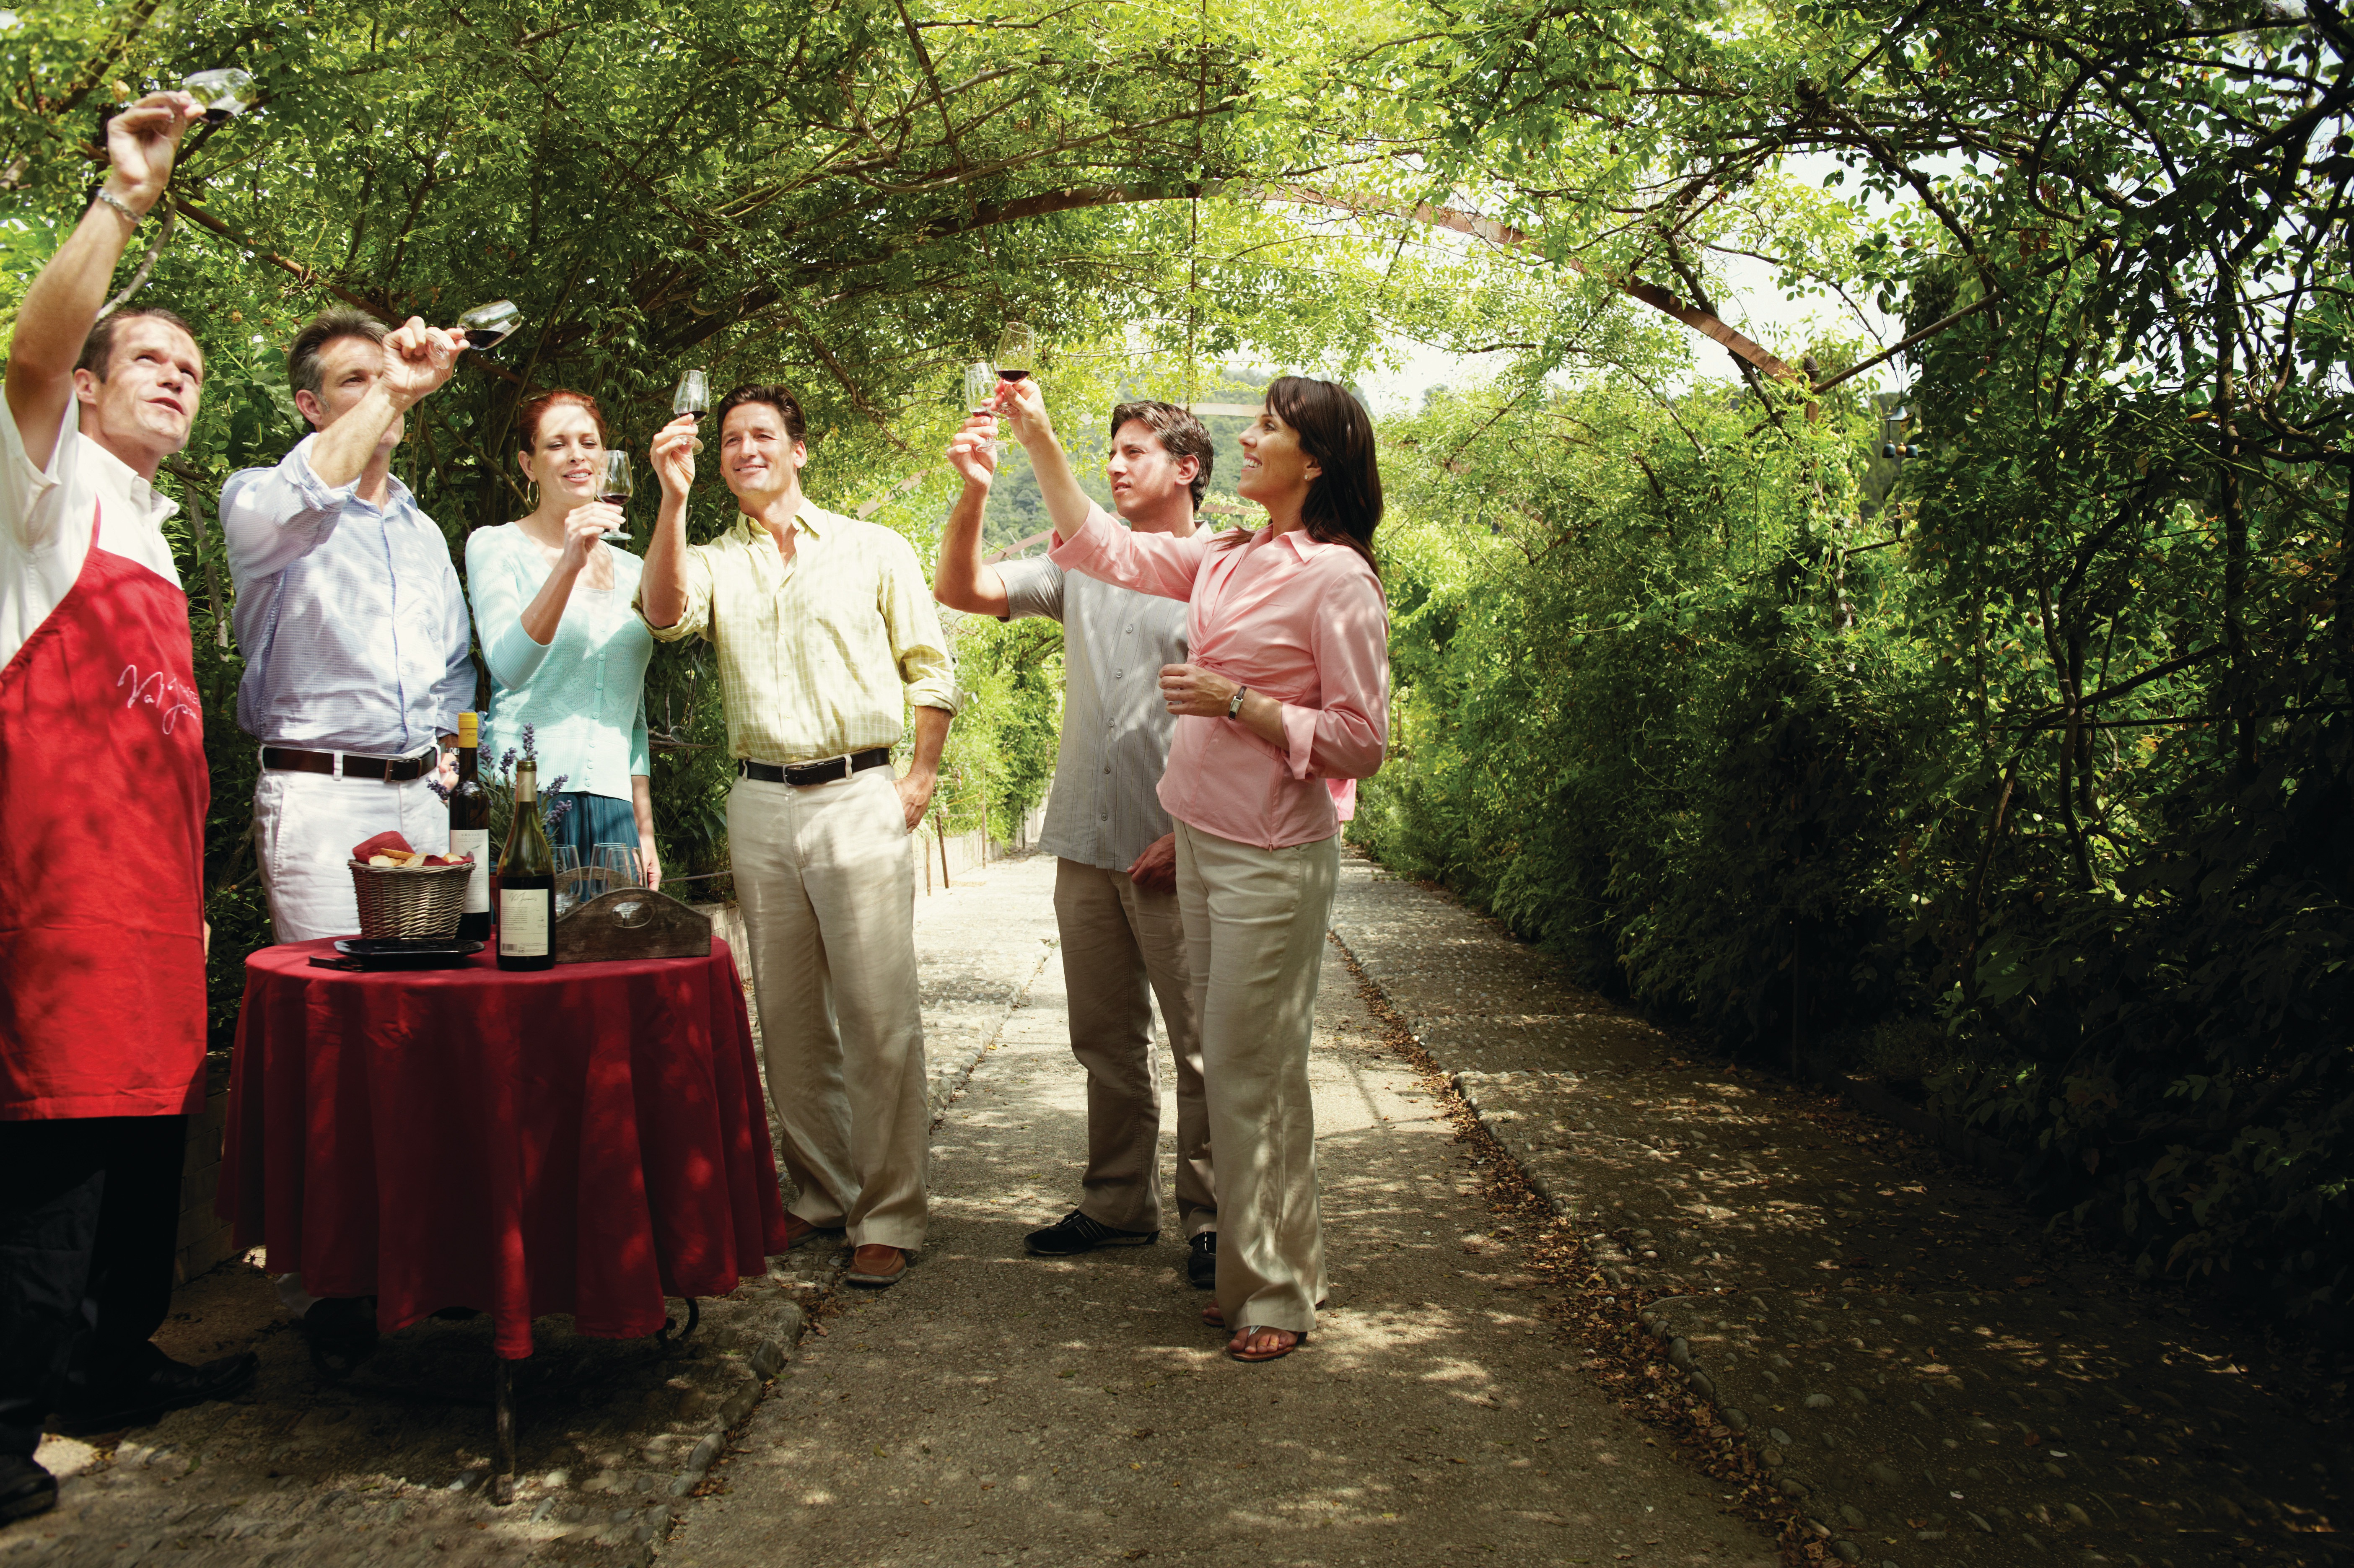 Silversea wine tasting excursion